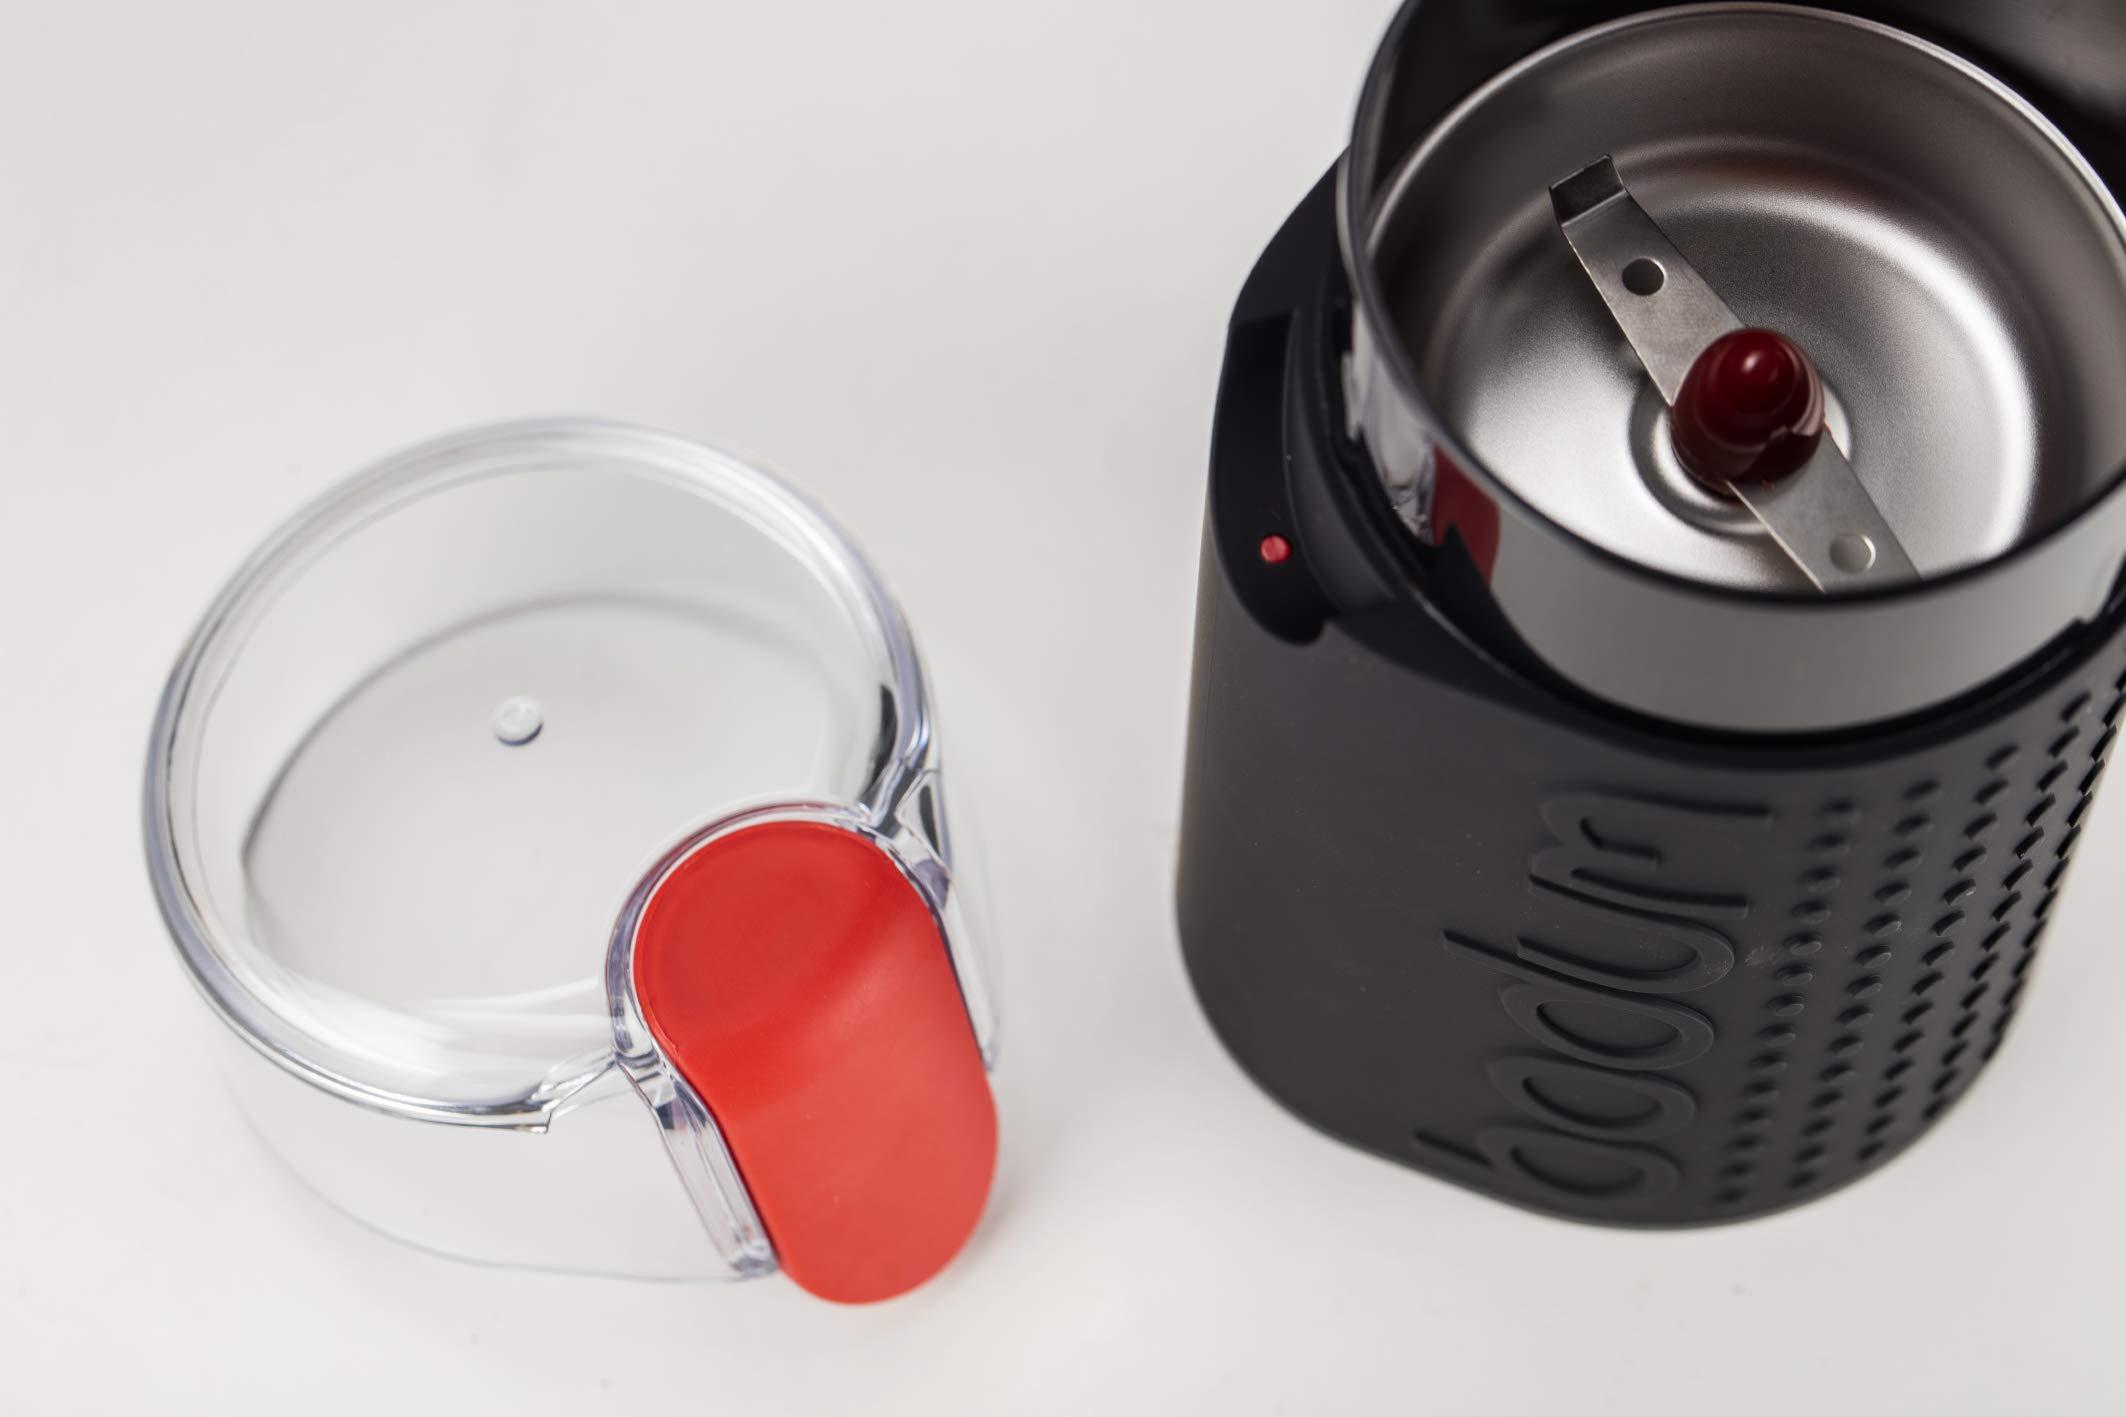 Bodum BISTRO Blade Grinder, Electric Blade Coffee Grinder, Black by Bodum (Image #7)